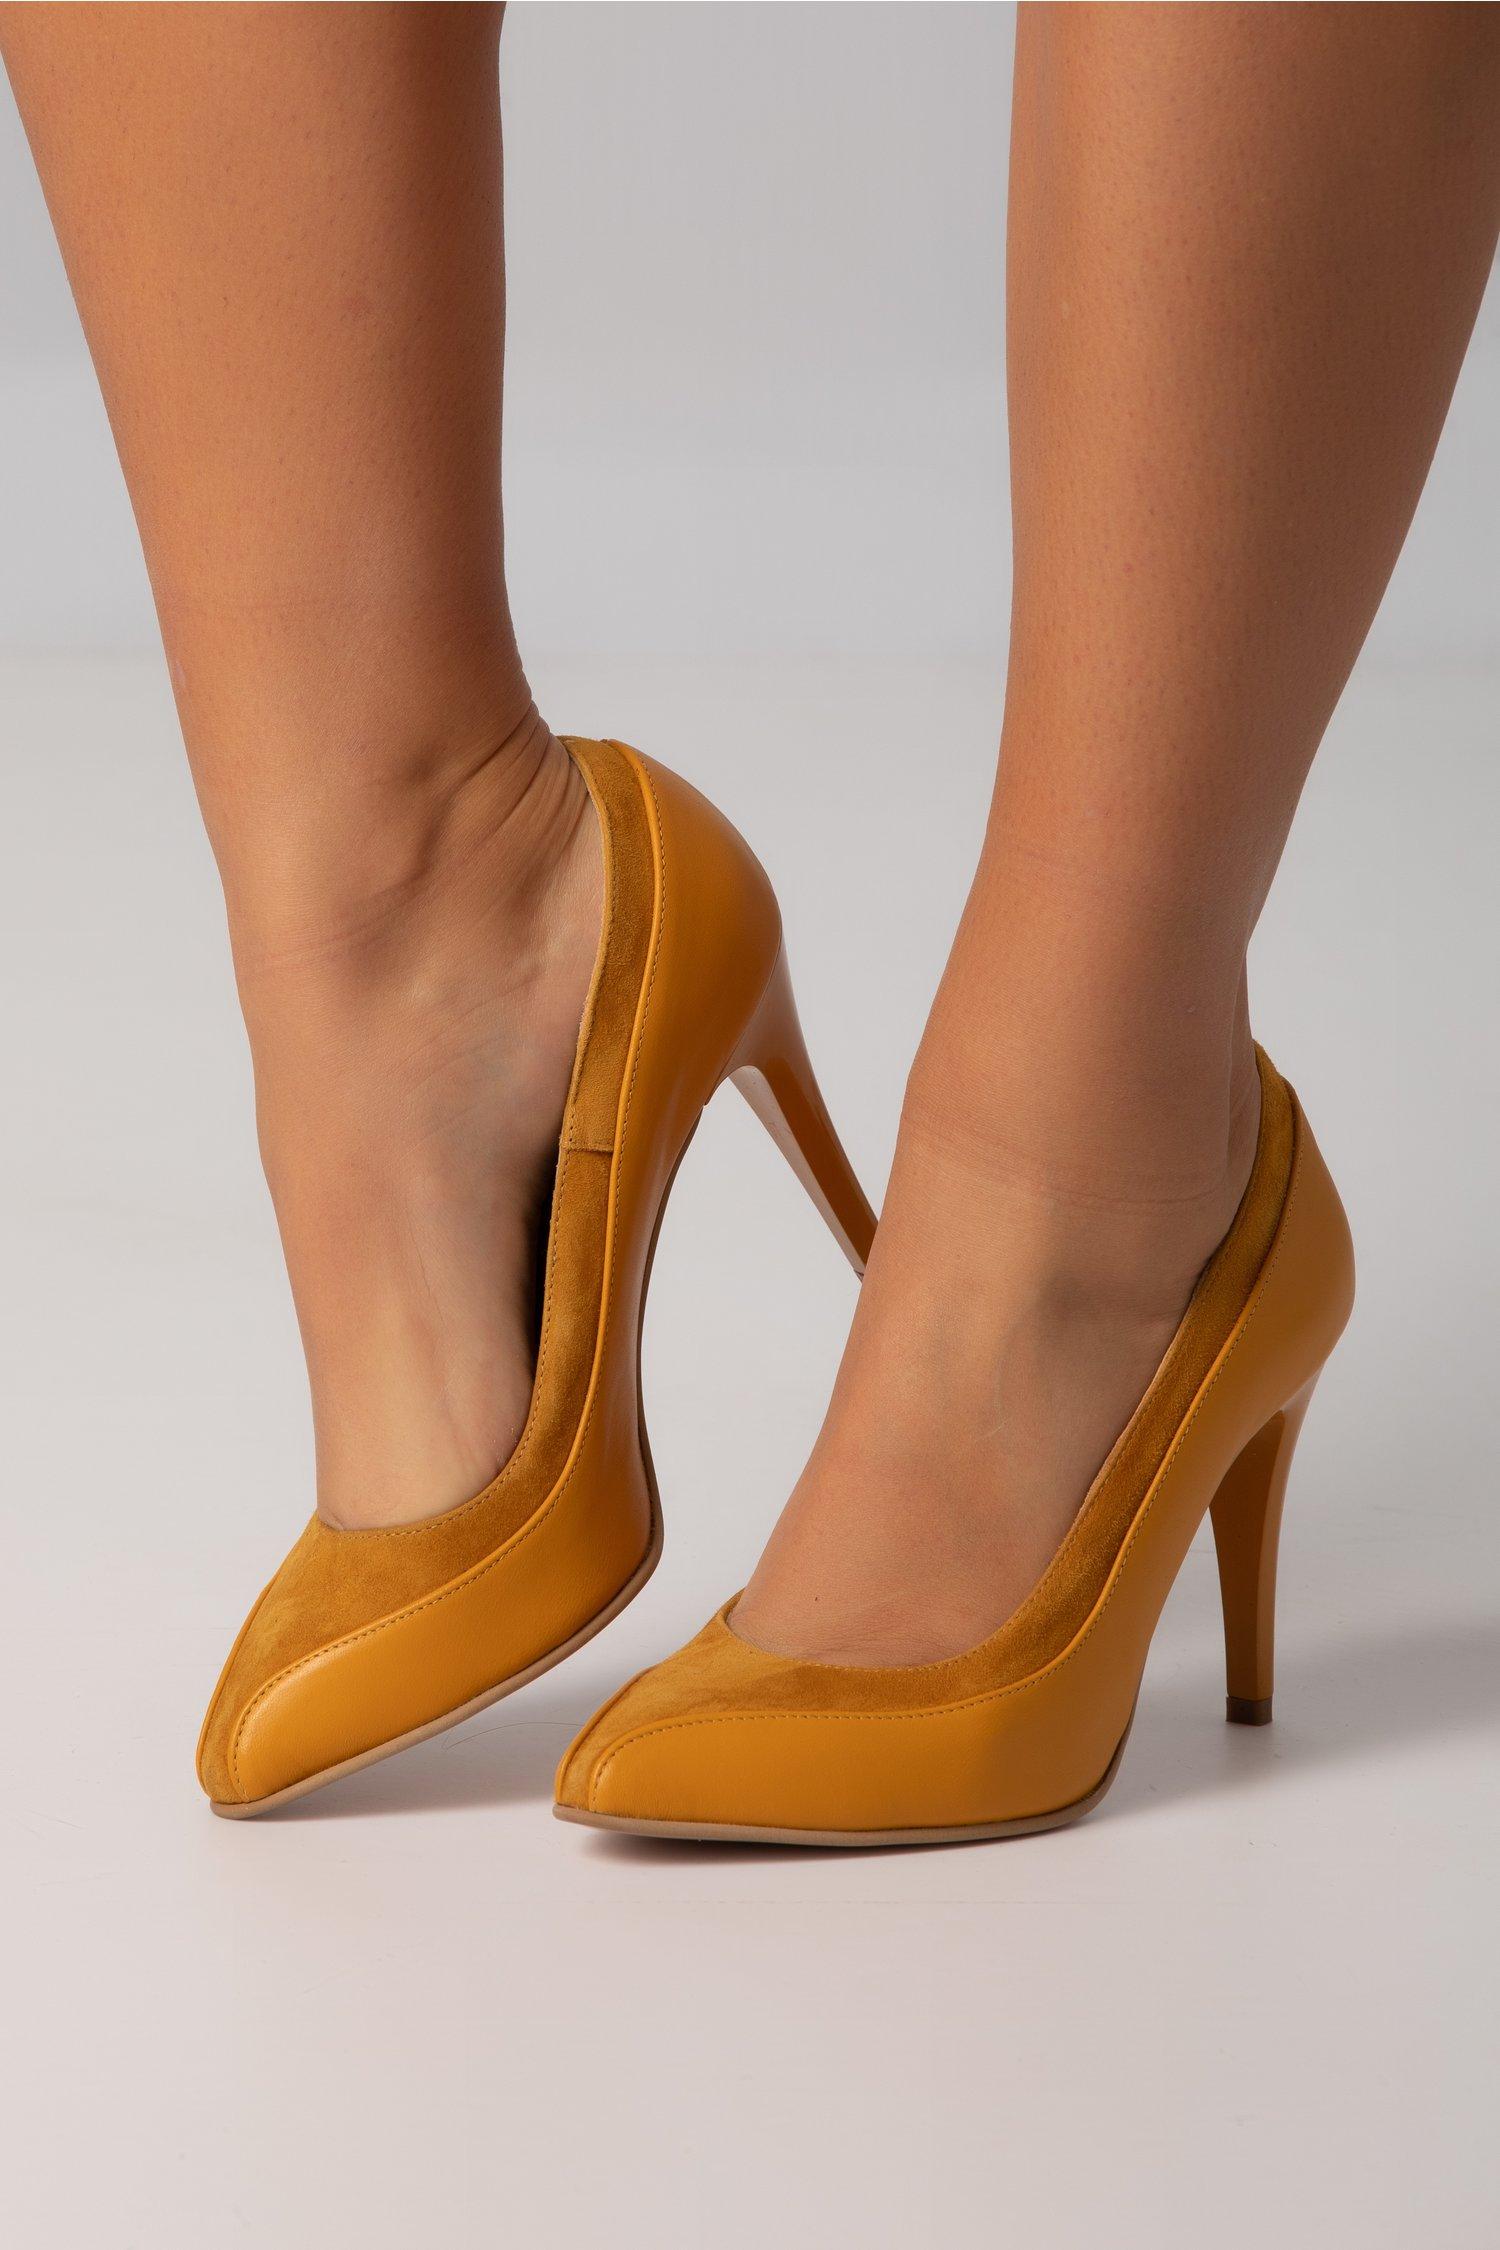 Pantofi galben mustar cu design deosebit si toc subtire